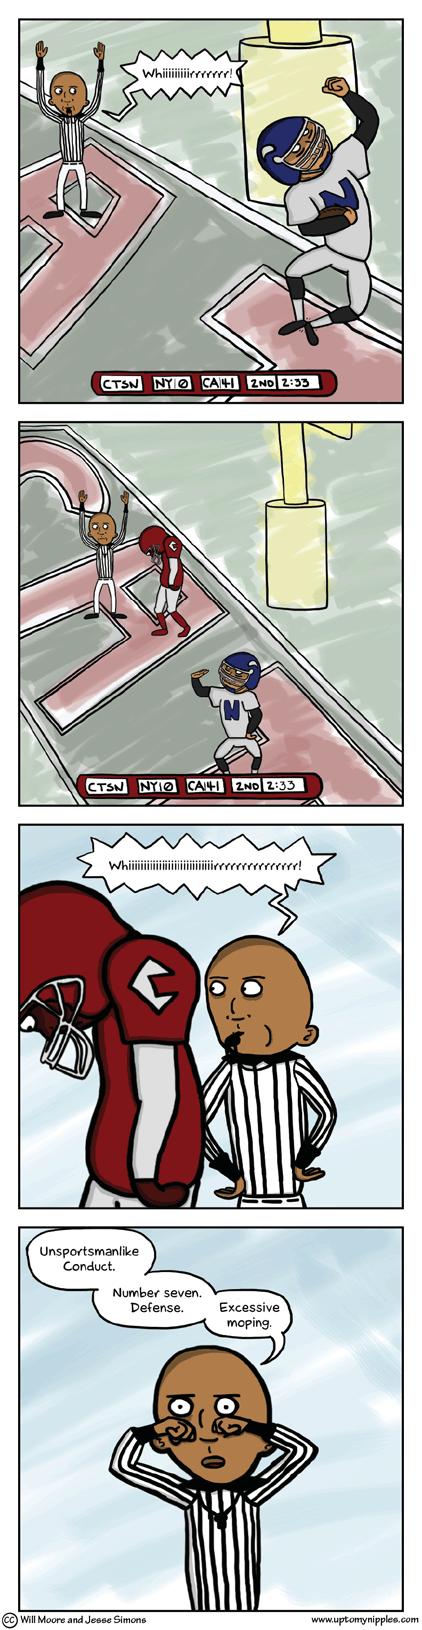 Super Bawl comic